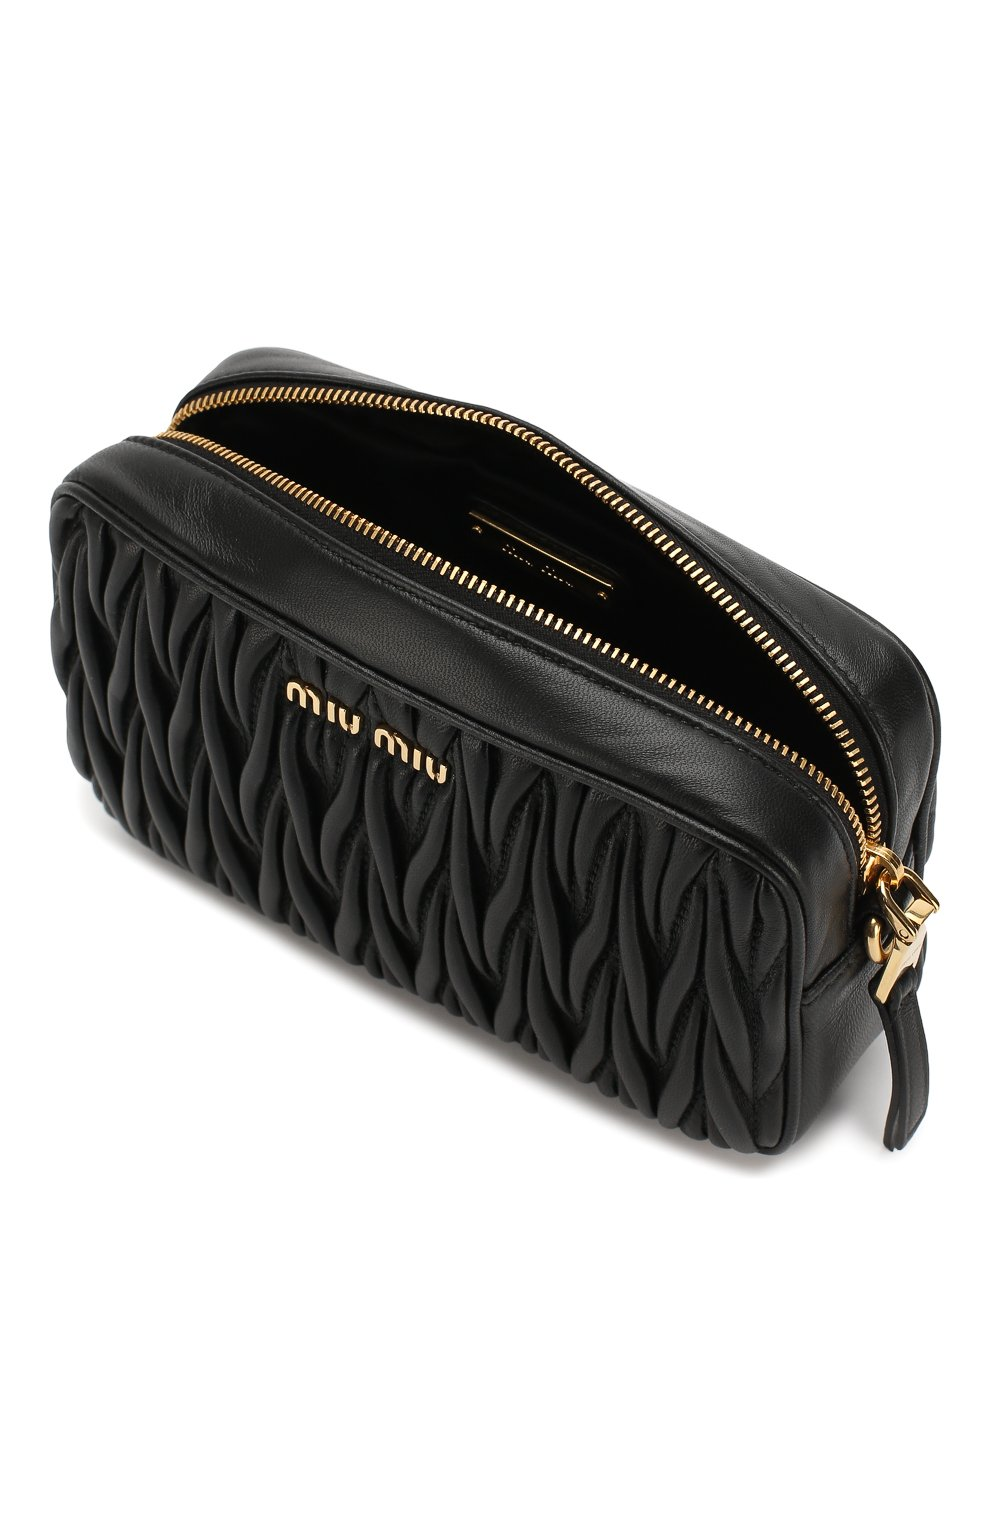 Женская поясная сумка MIU MIU черного цвета, арт. 5BL005-N88-F0002-COO | Фото 4